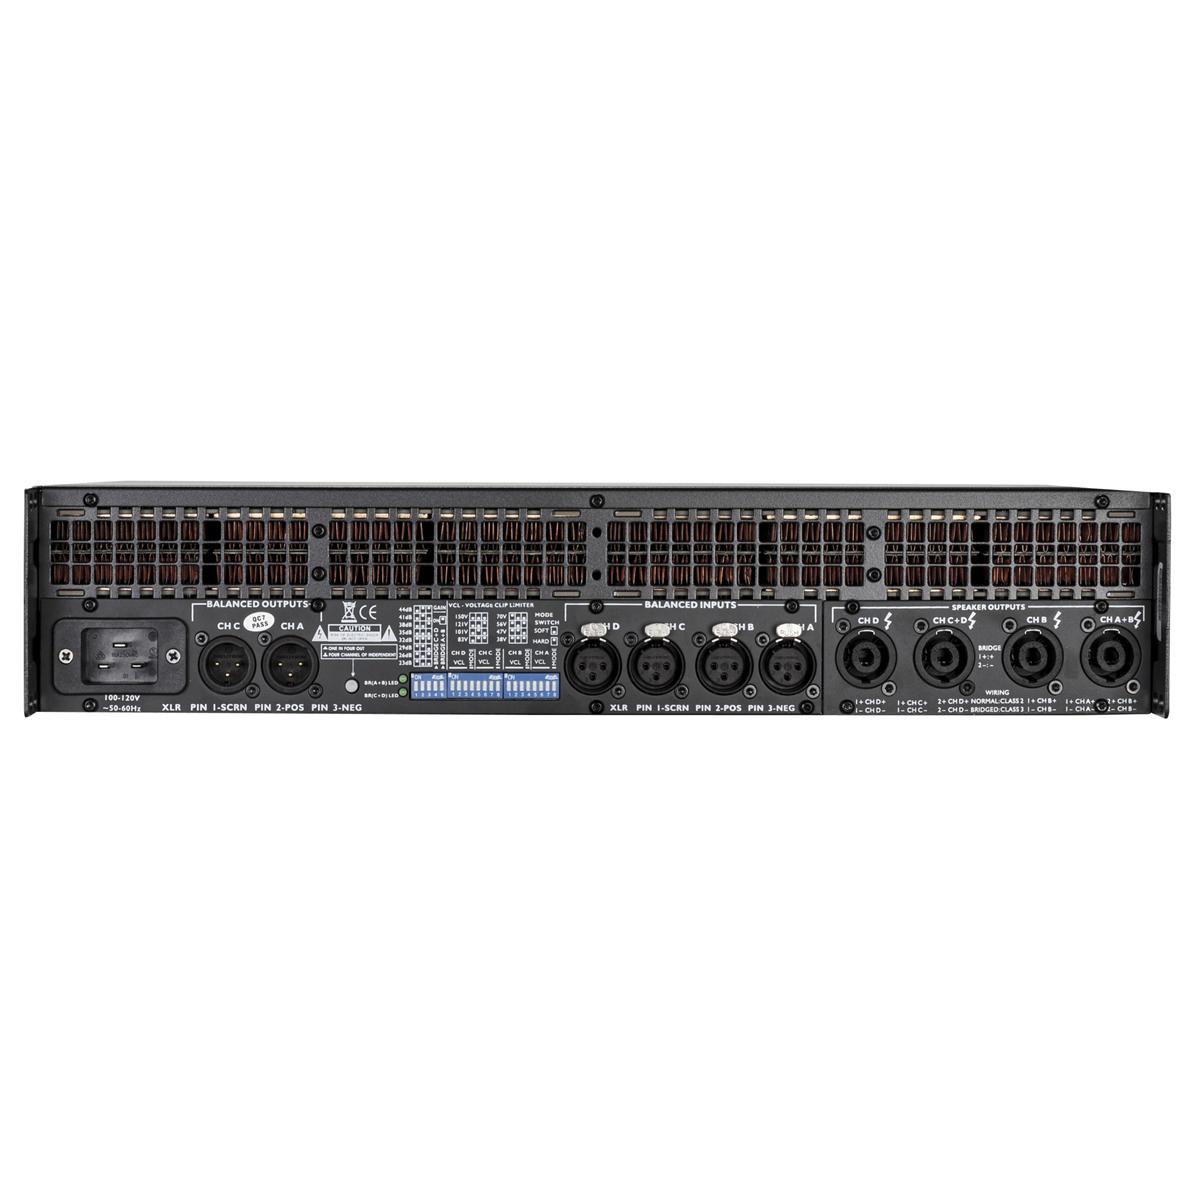 2800w High Power Audio Amplifier